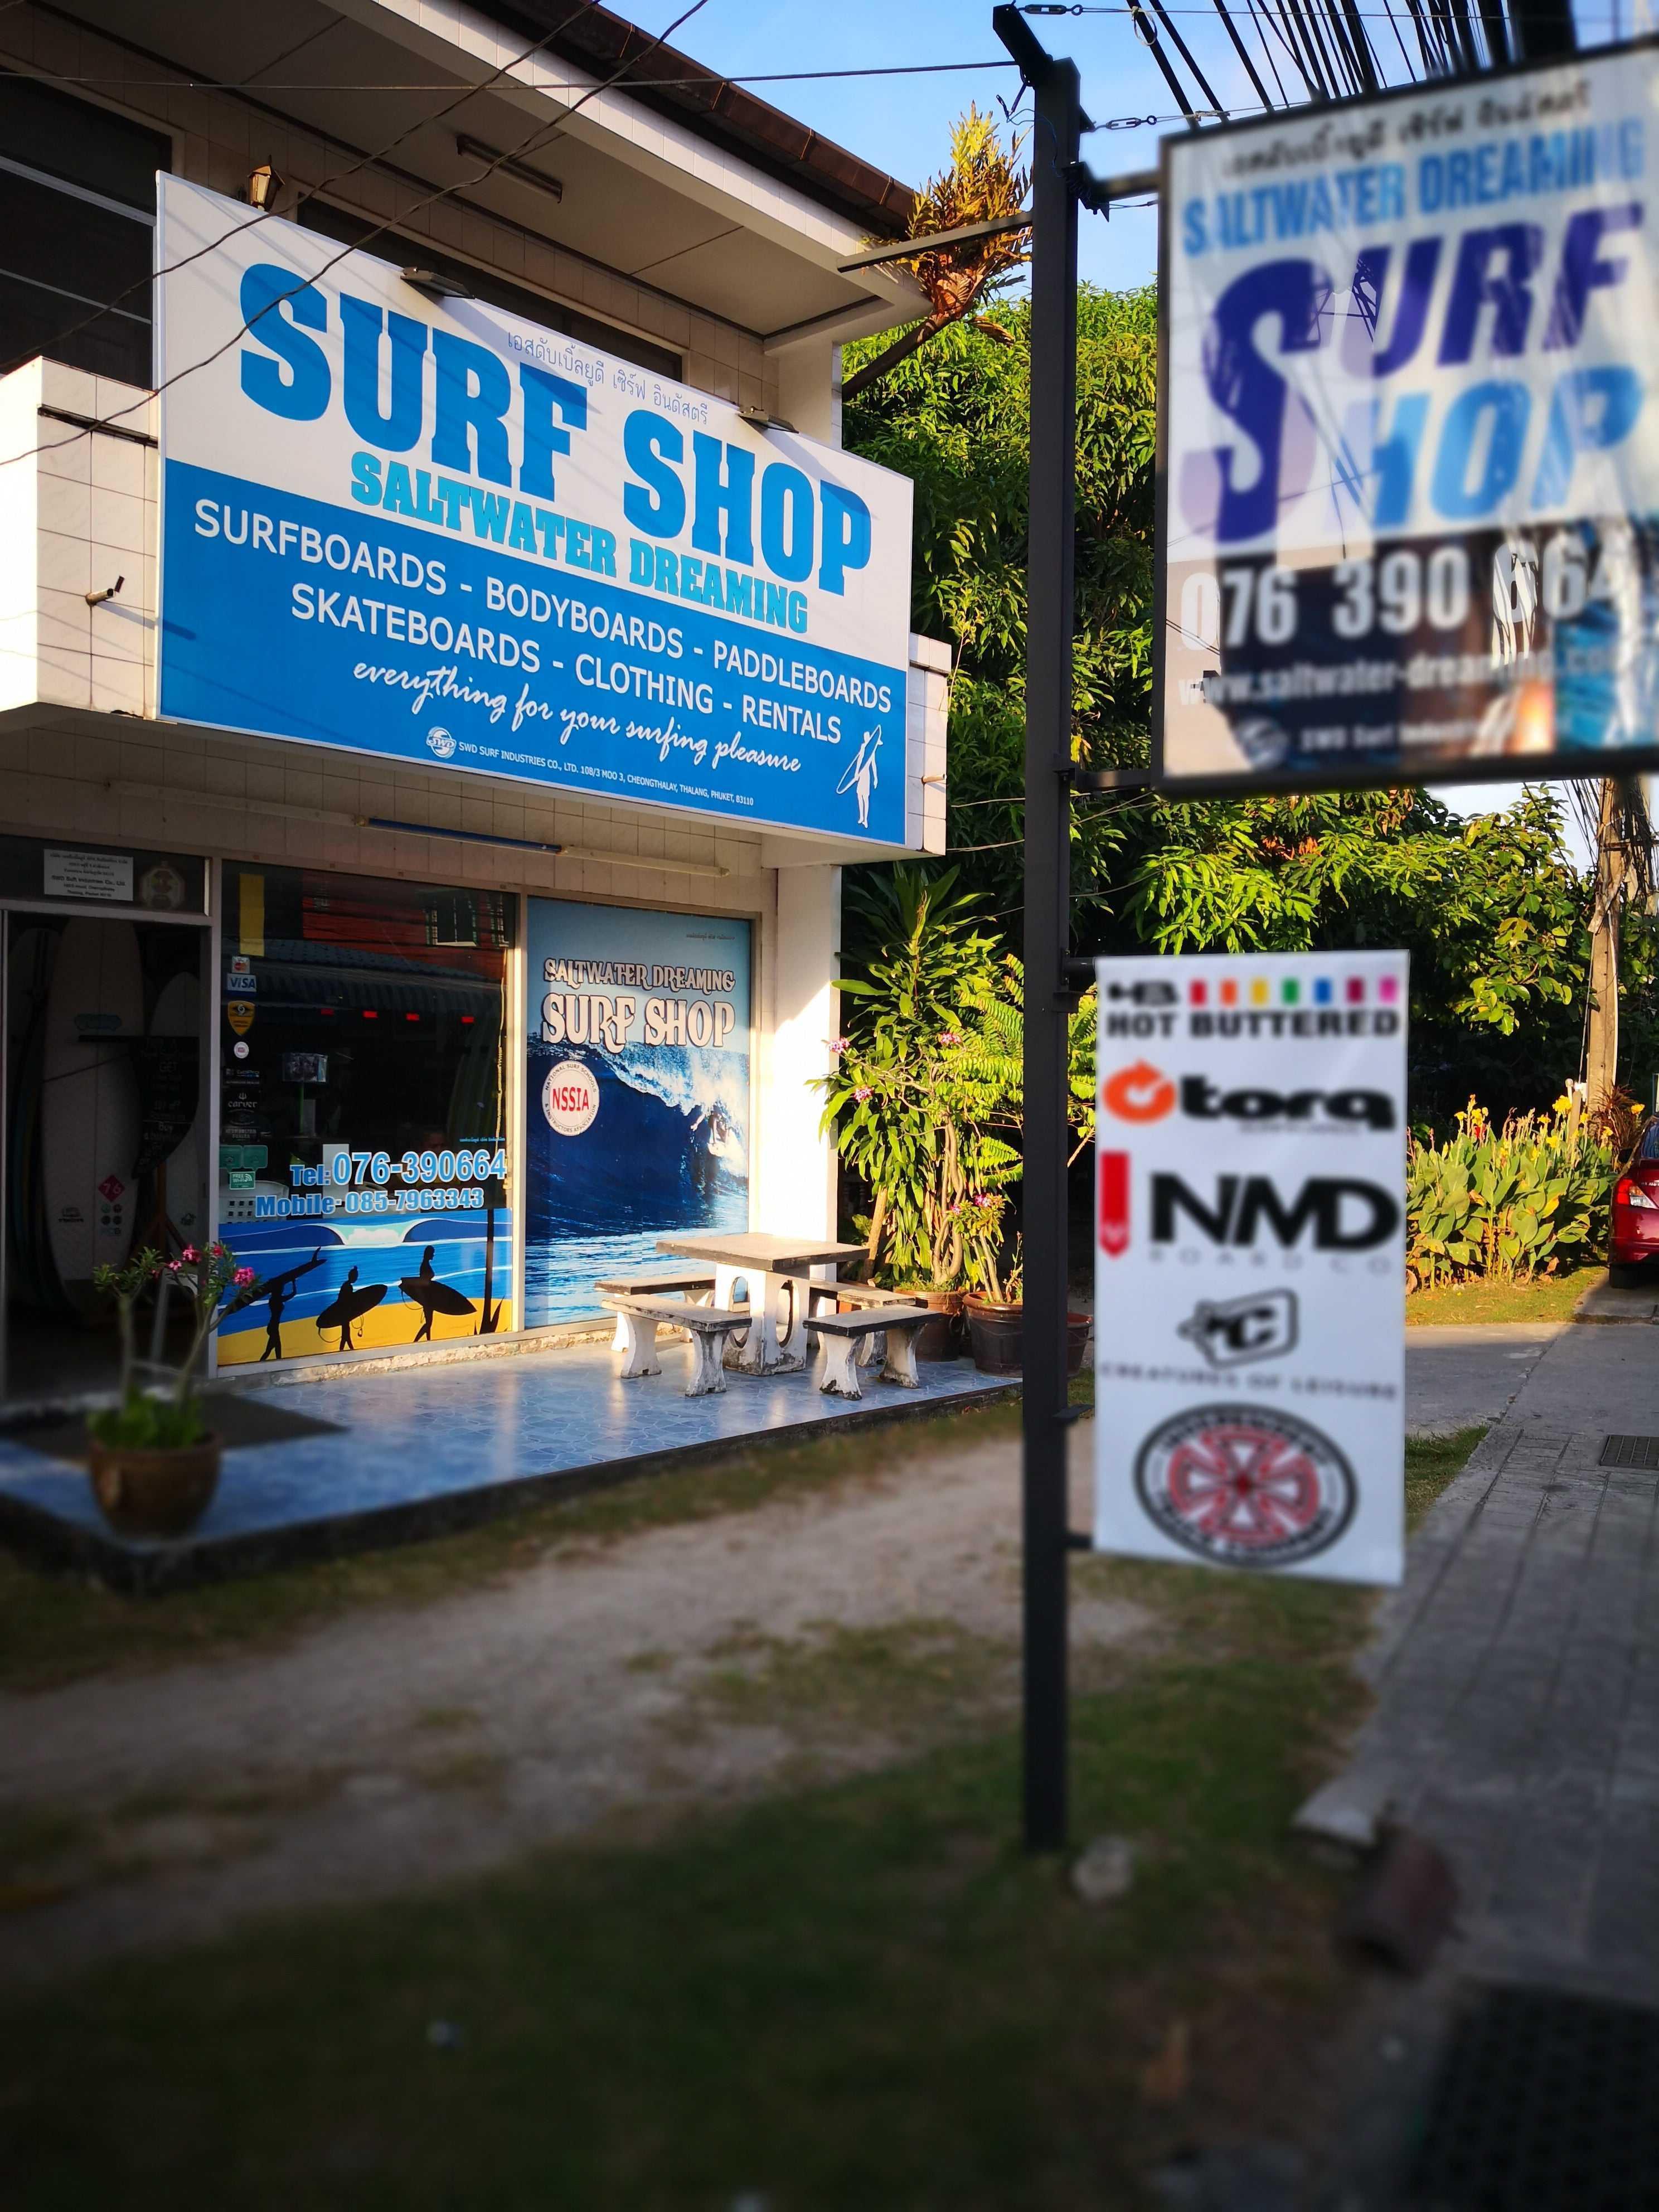 Saltwater Dreaming Surf Shop